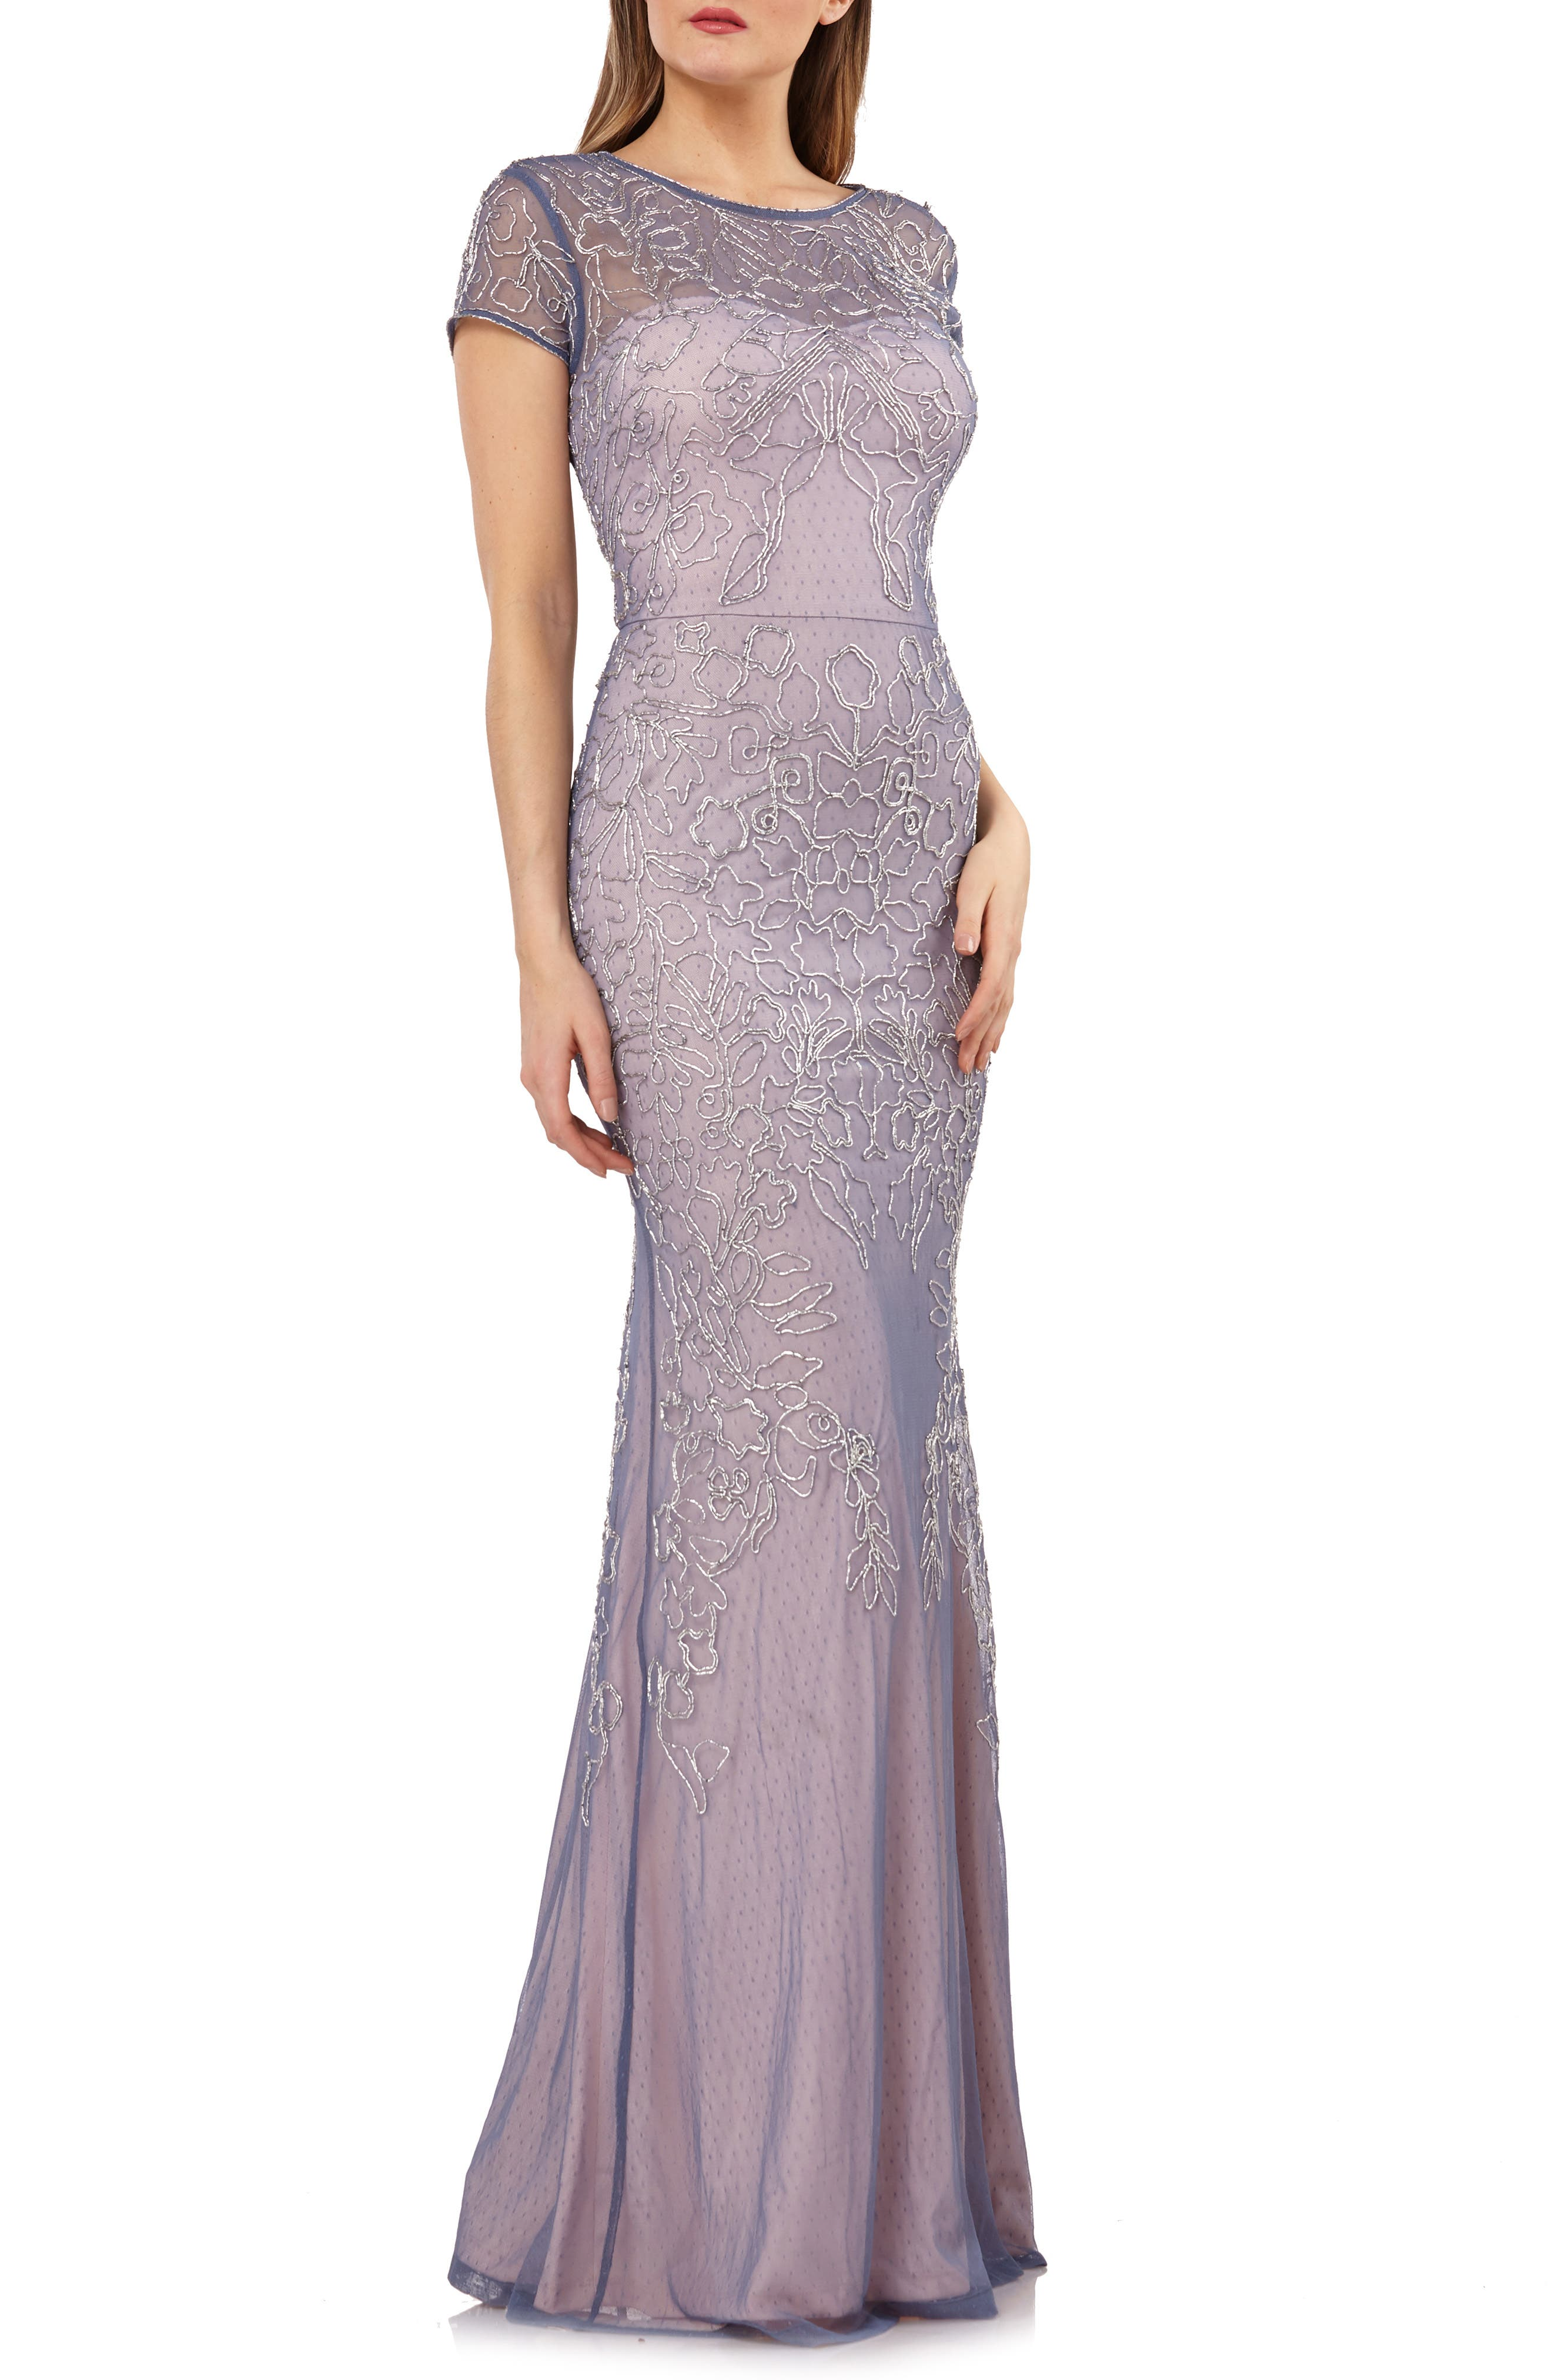 Js Collections Soutache Mesh Evening Dress, Blue